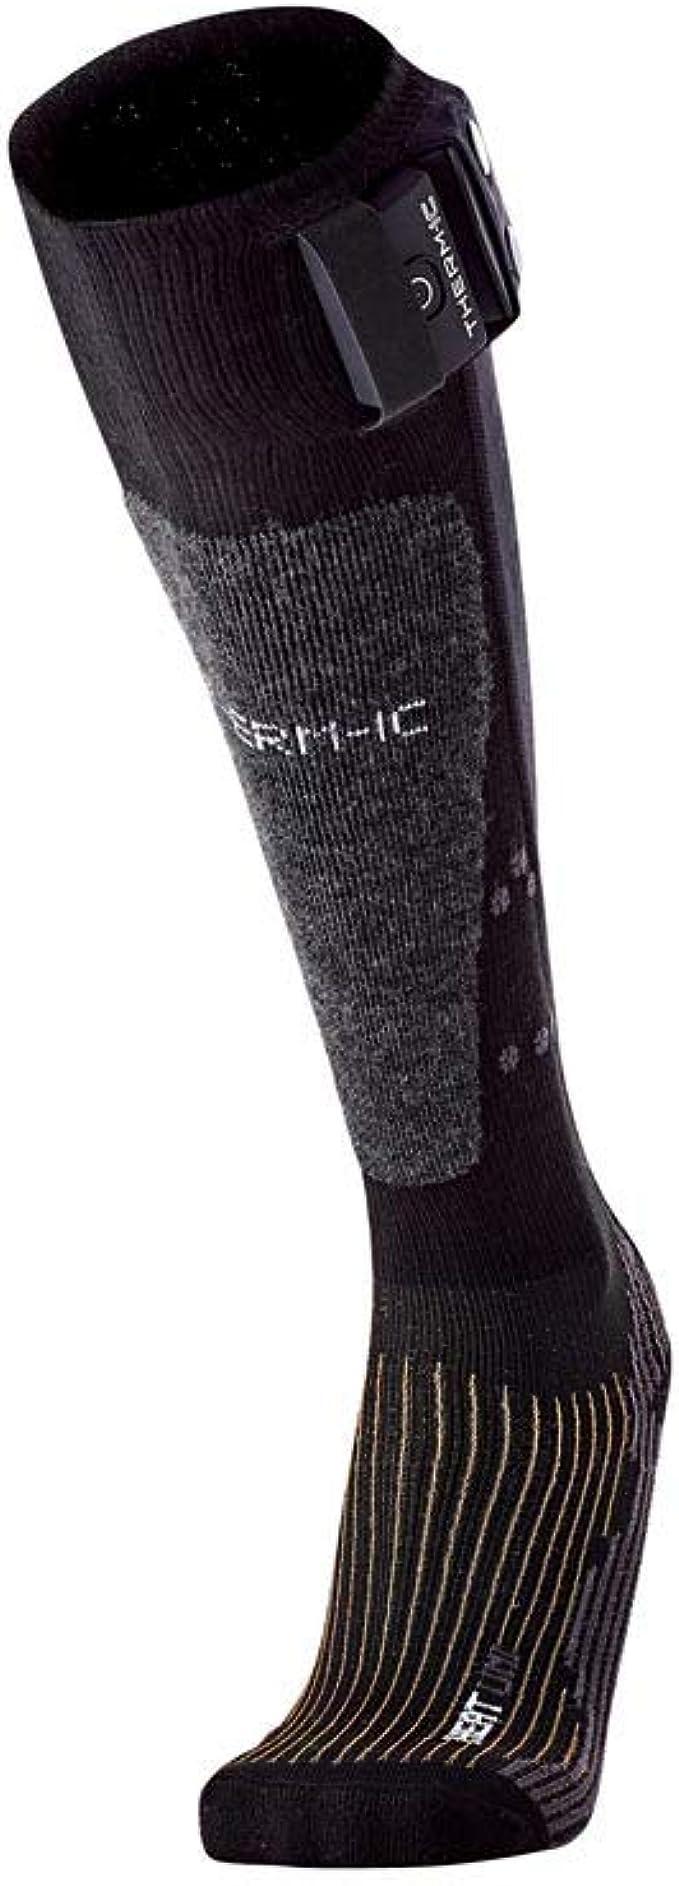 best heated ski socks